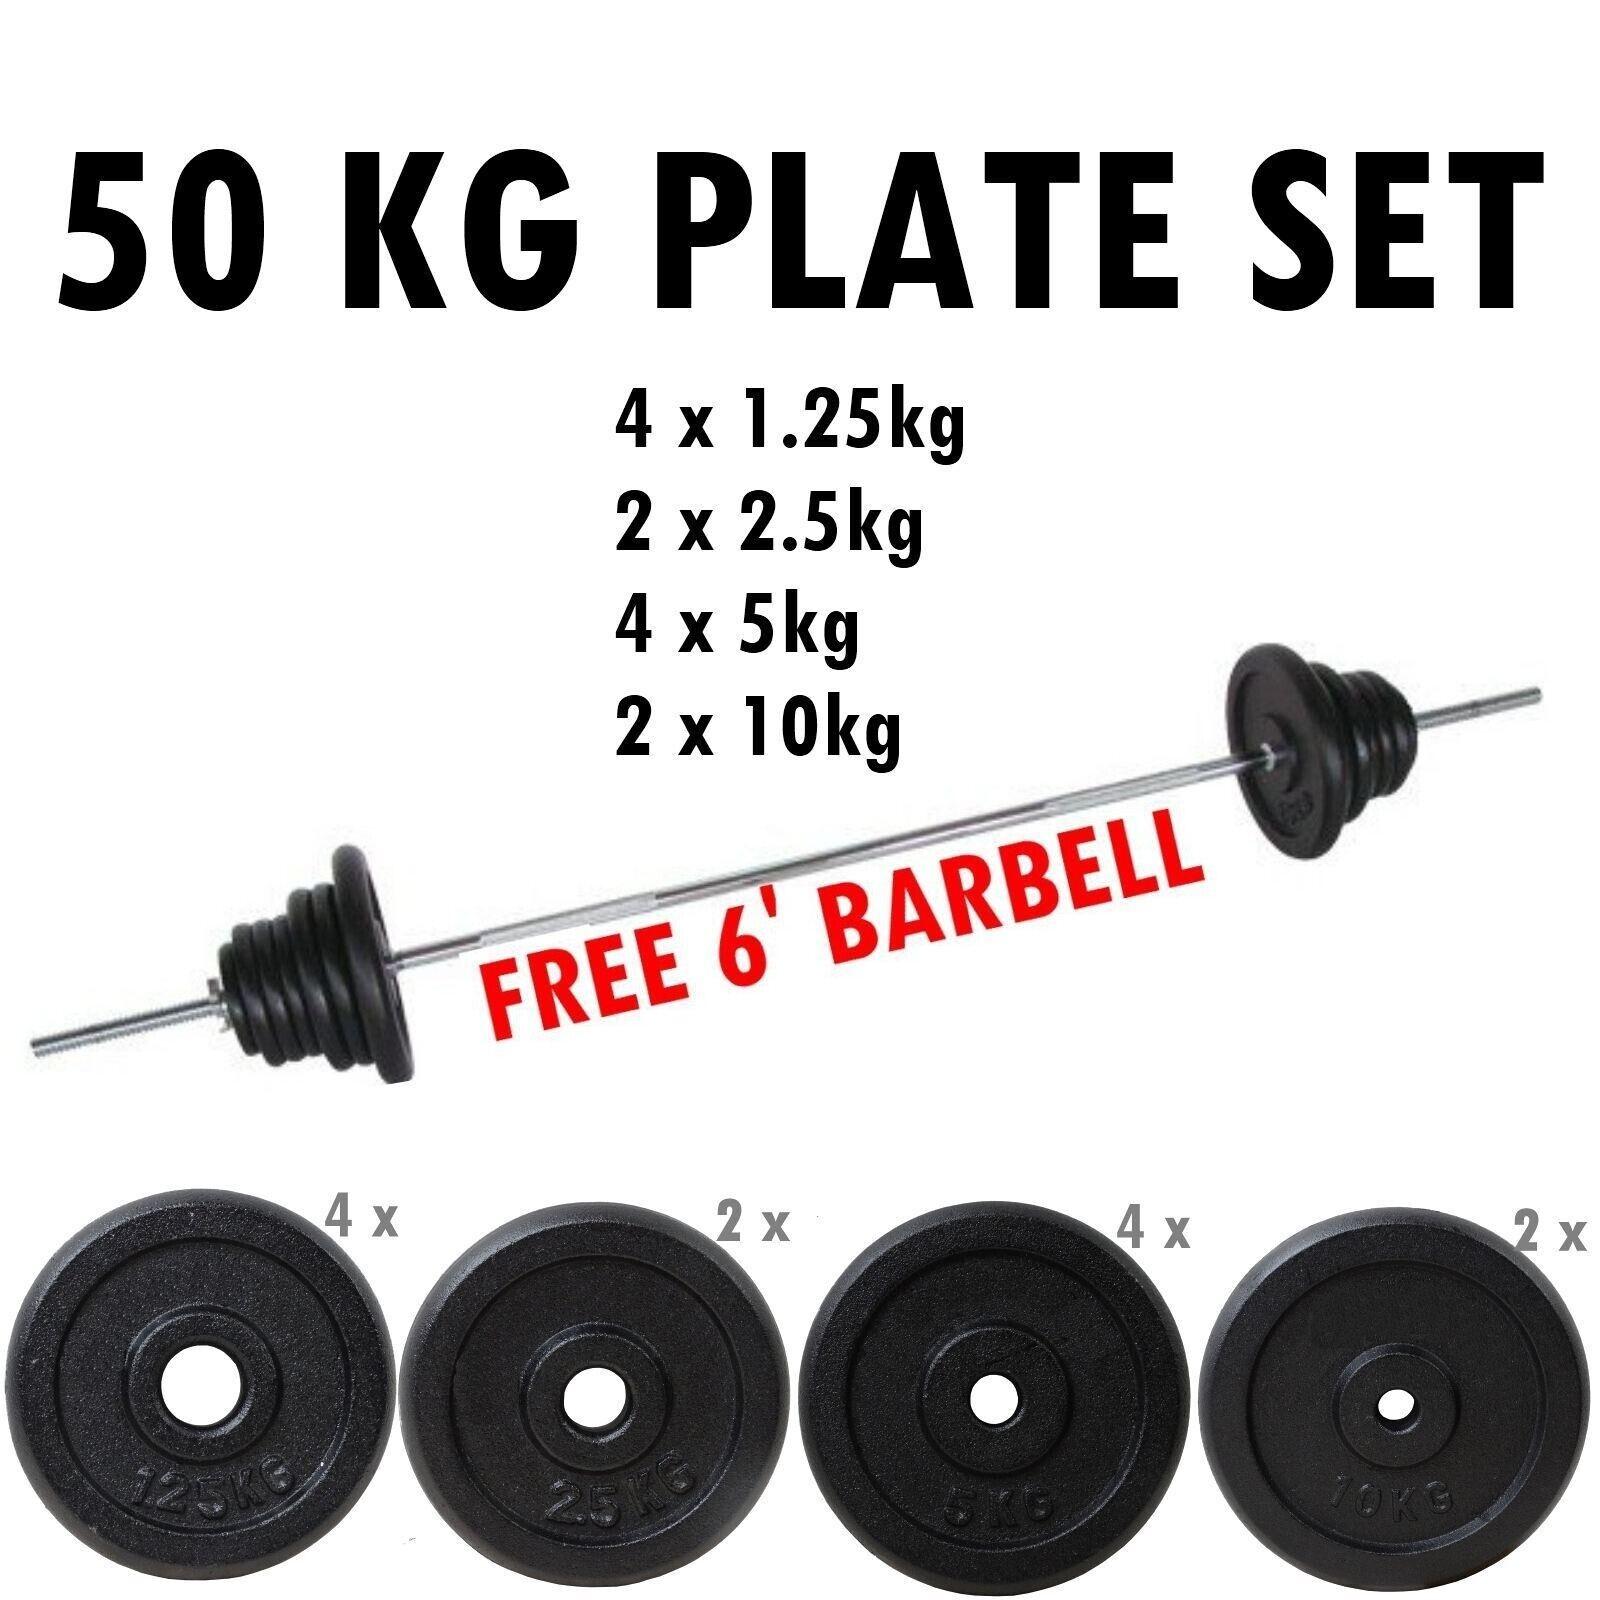 Bodyrip 50kg Bilanciere Set 2.5cm Foro Piastre Pesi Discs Eserzio Palestra Tuta